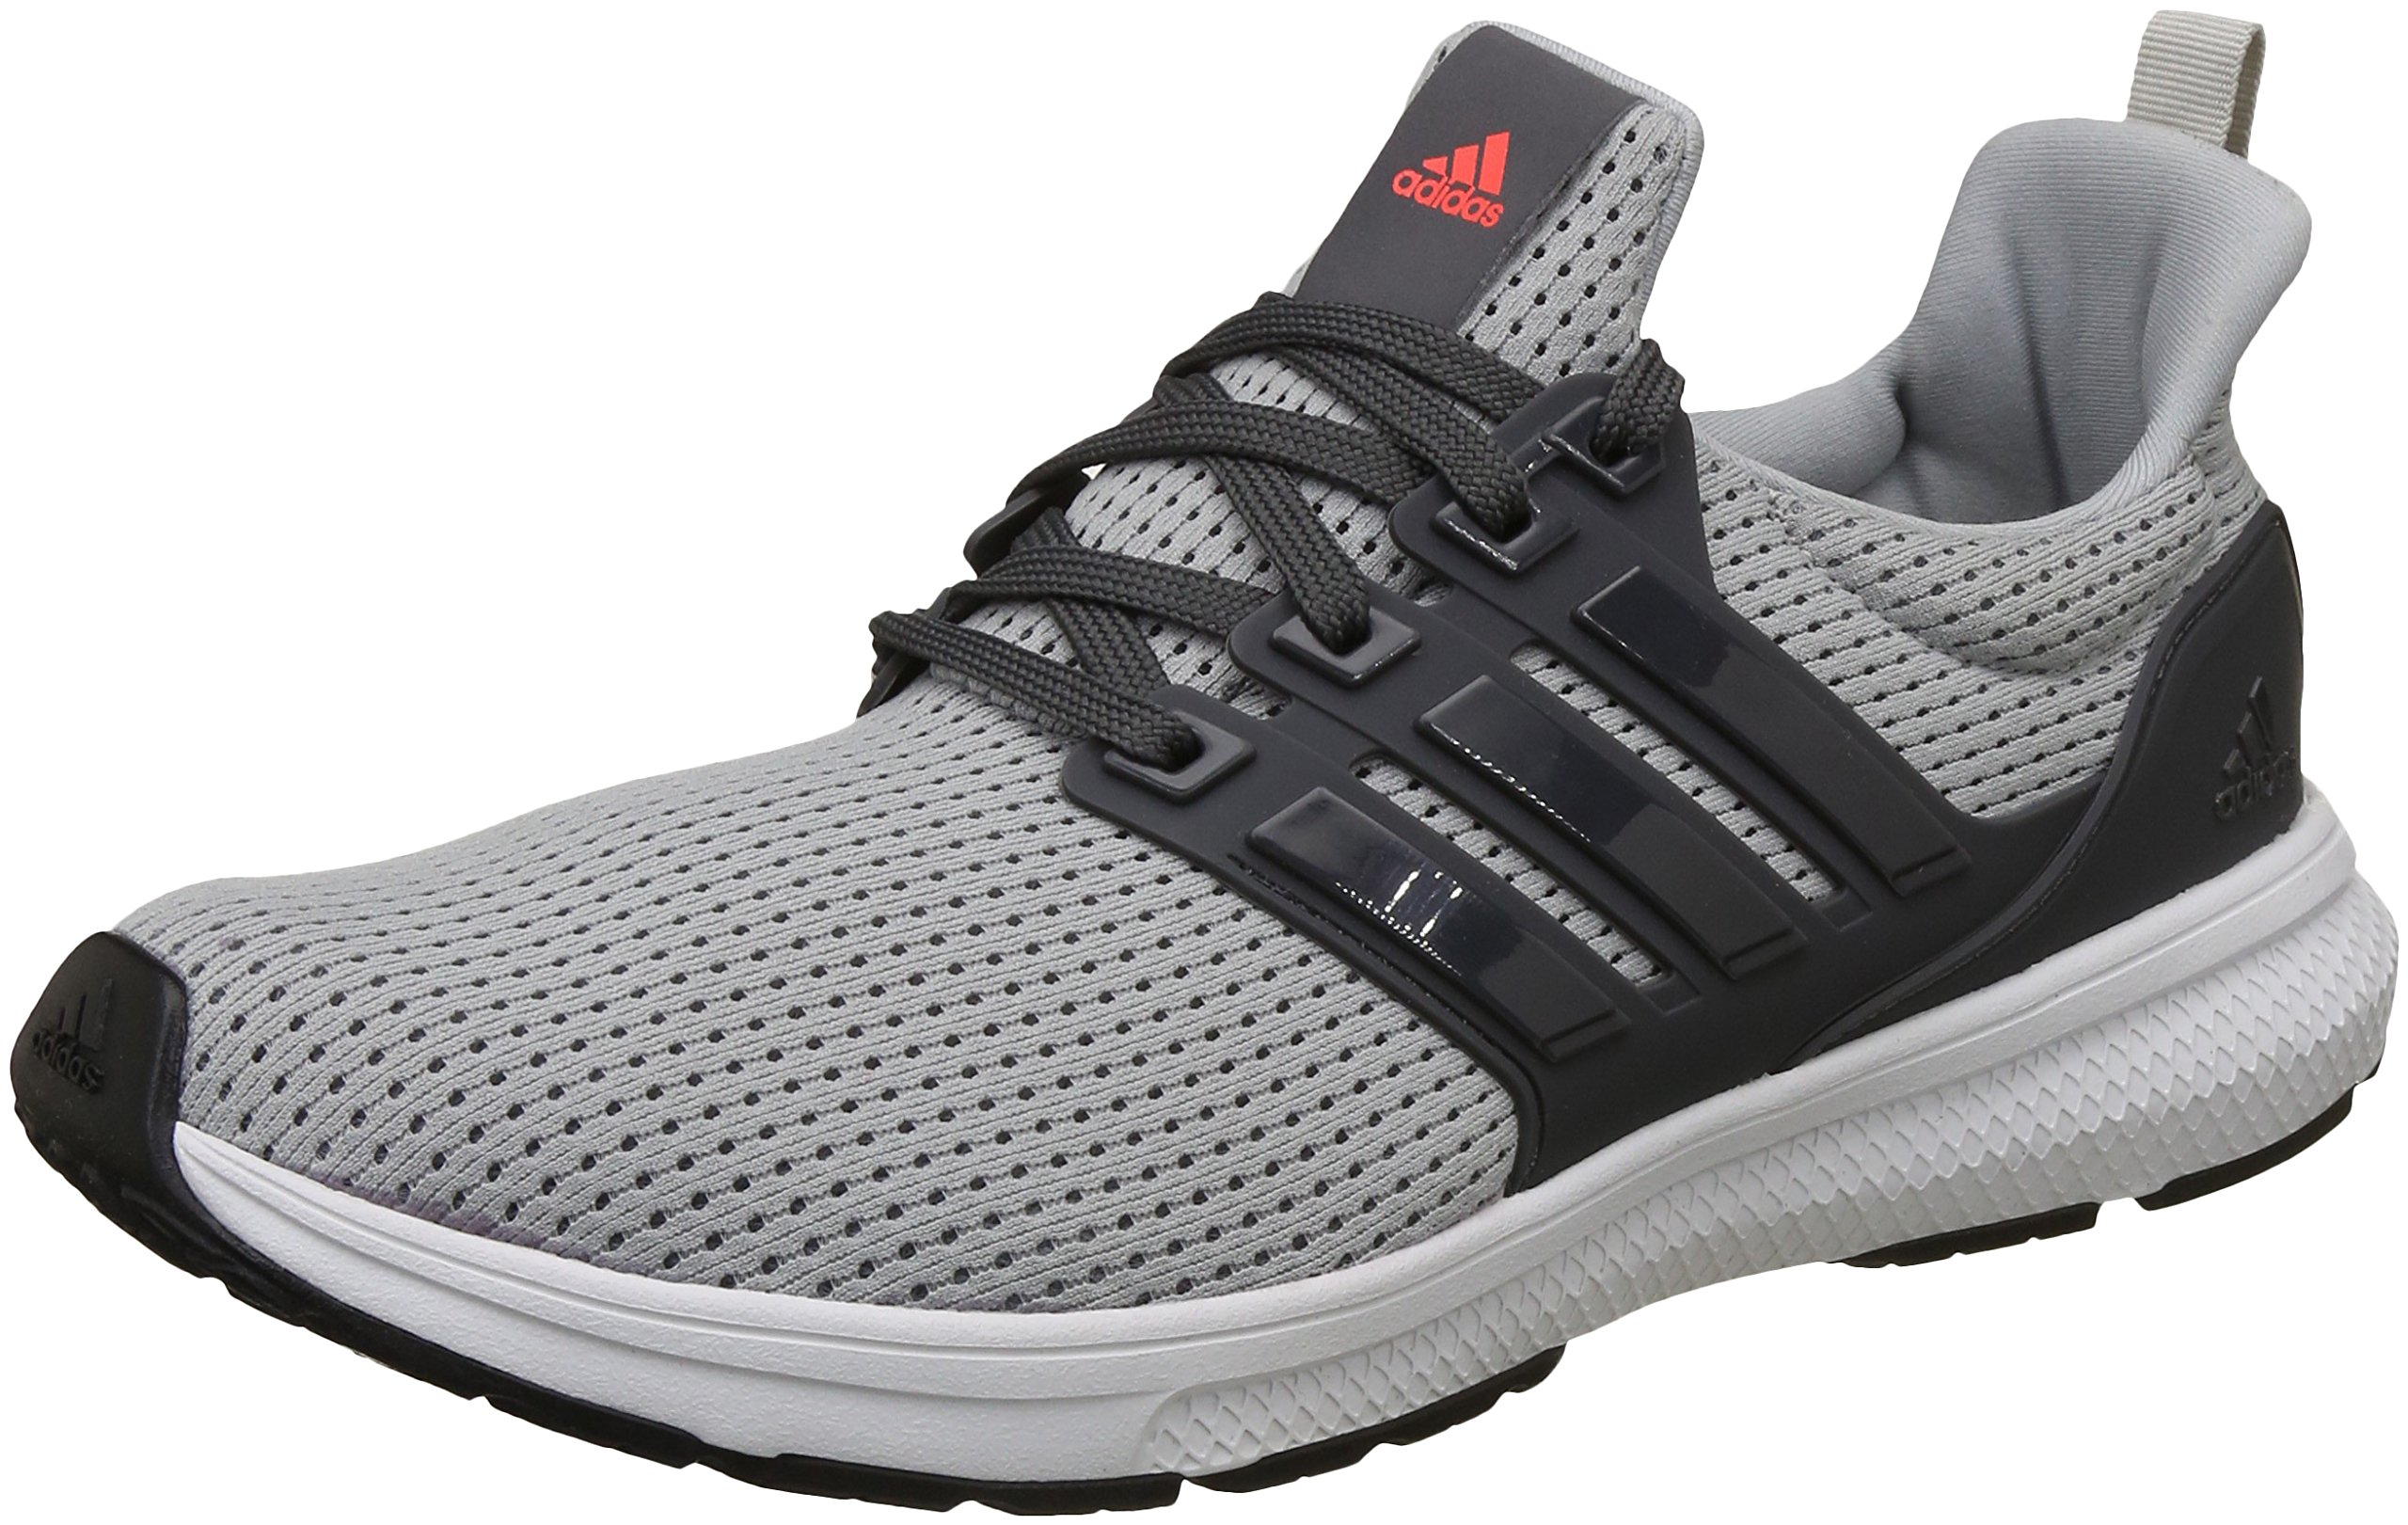 Adidas Men's Jerzo M Running Shoes- Buy